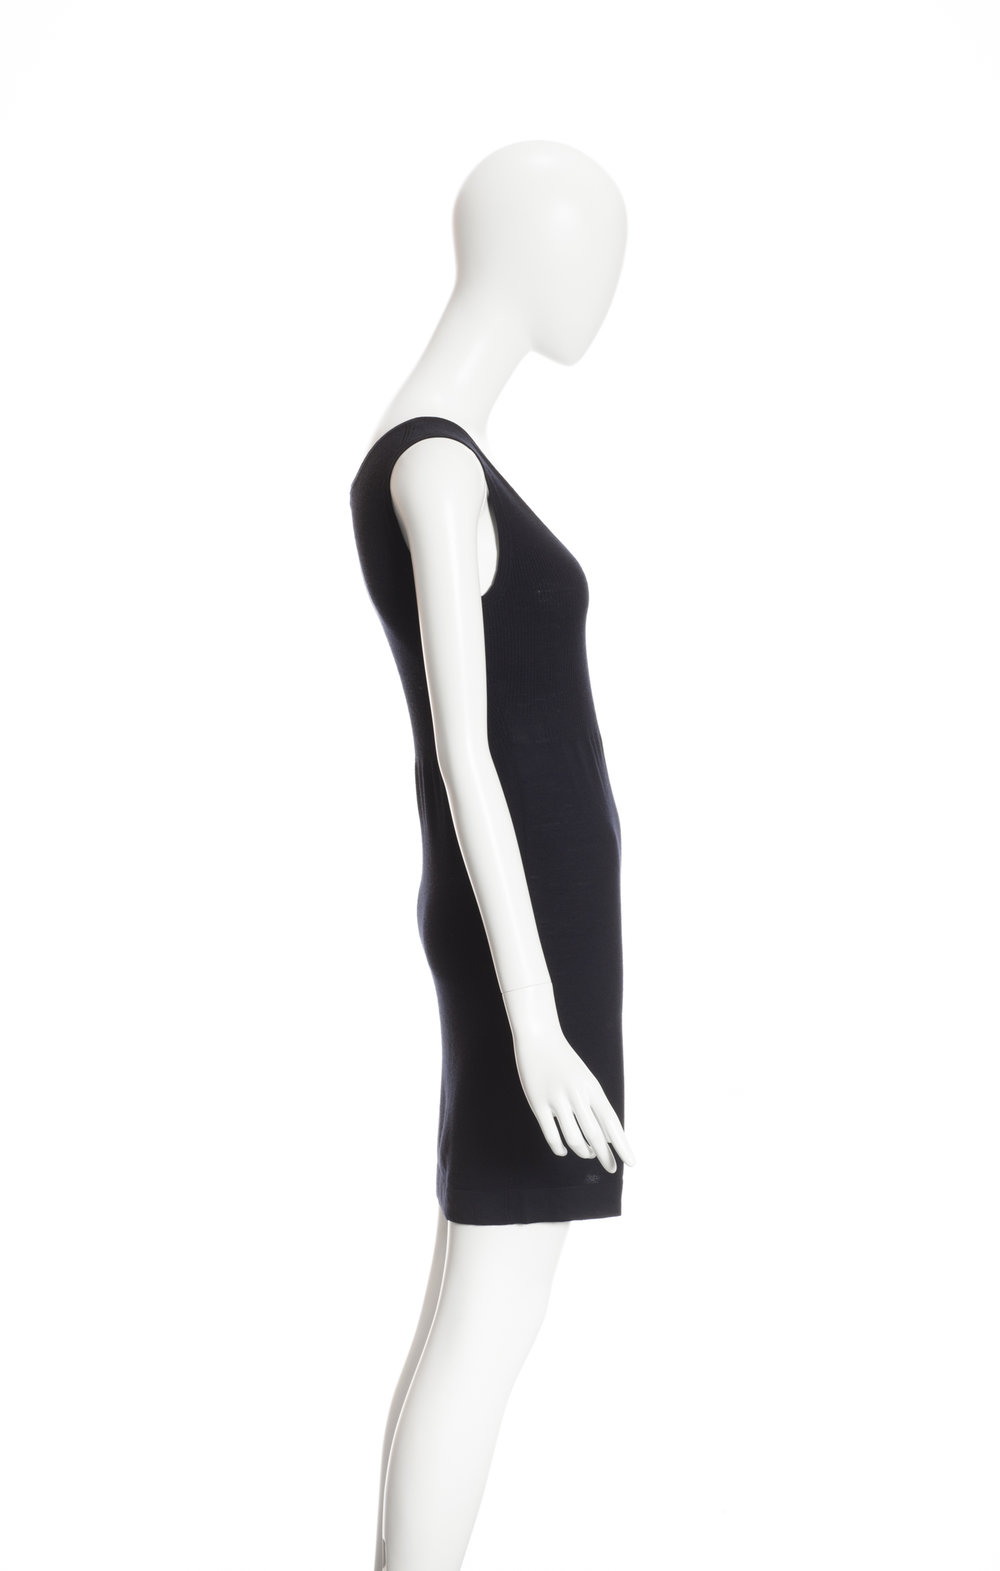 EUGENIE-F15-NUIT-SIDE-cavadesoi_knitwear-4702.jpg